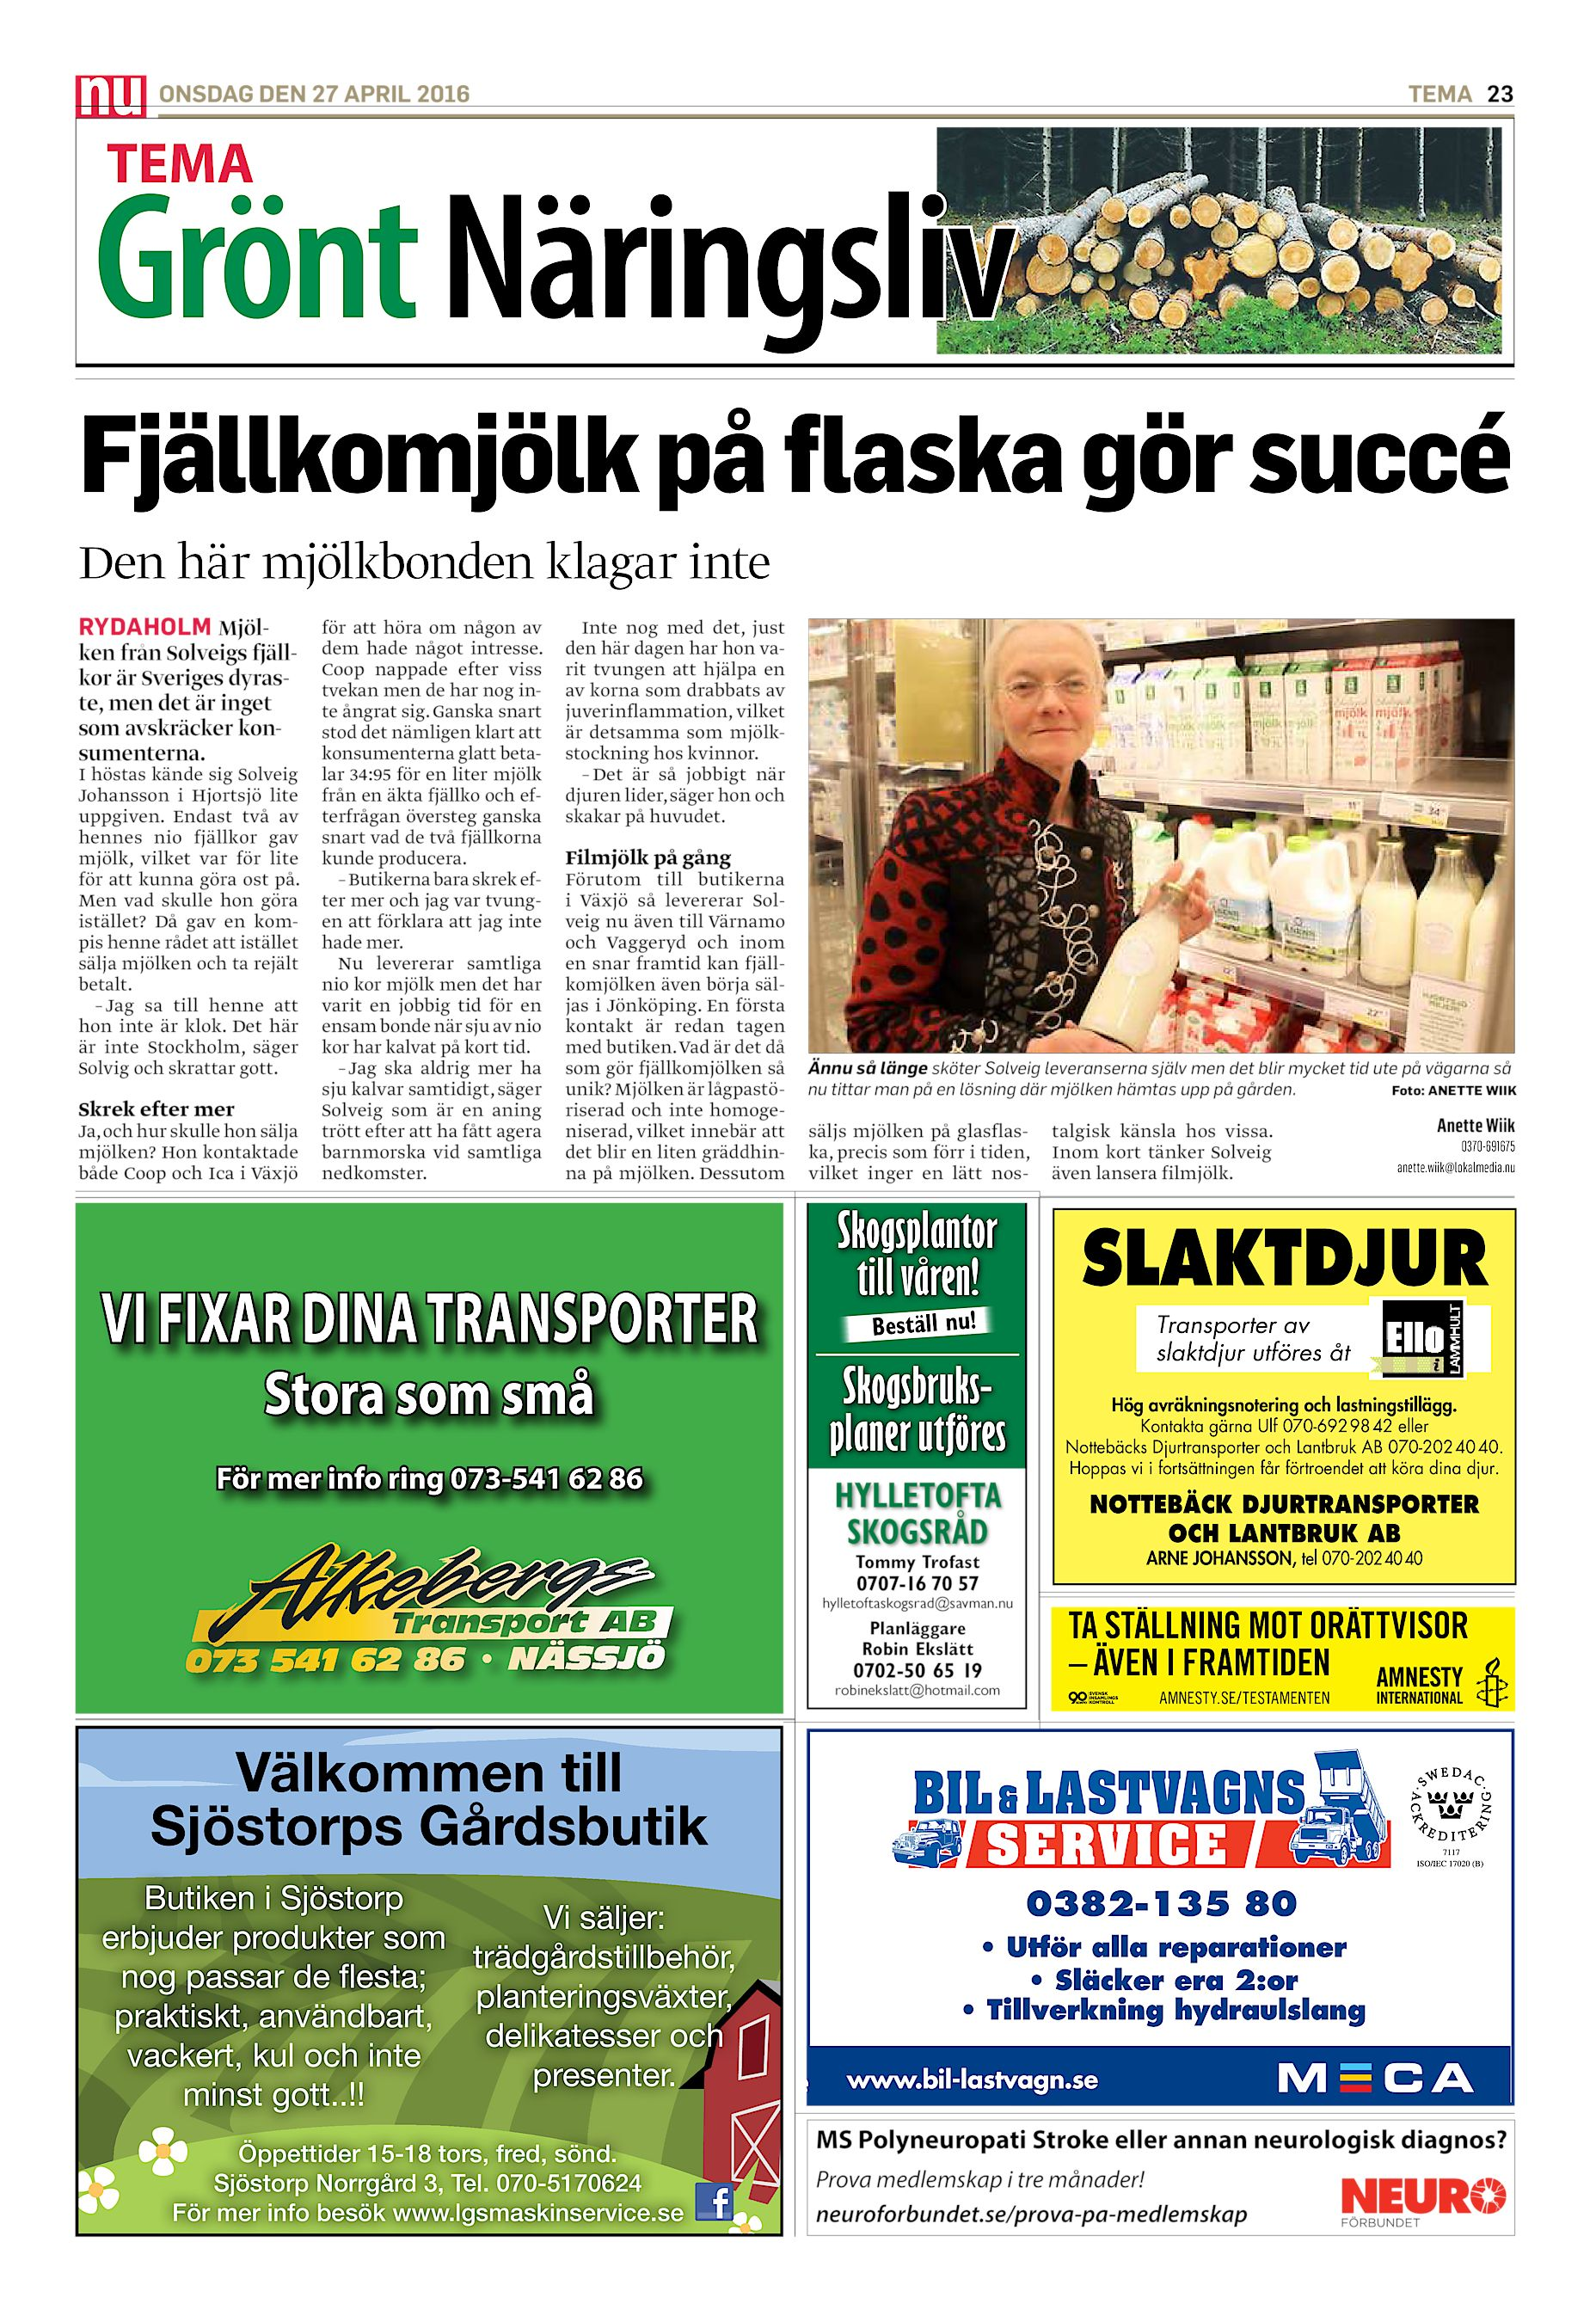 Ann-Christine Blomgren, 56 r i Norrhult p Hultkra 2